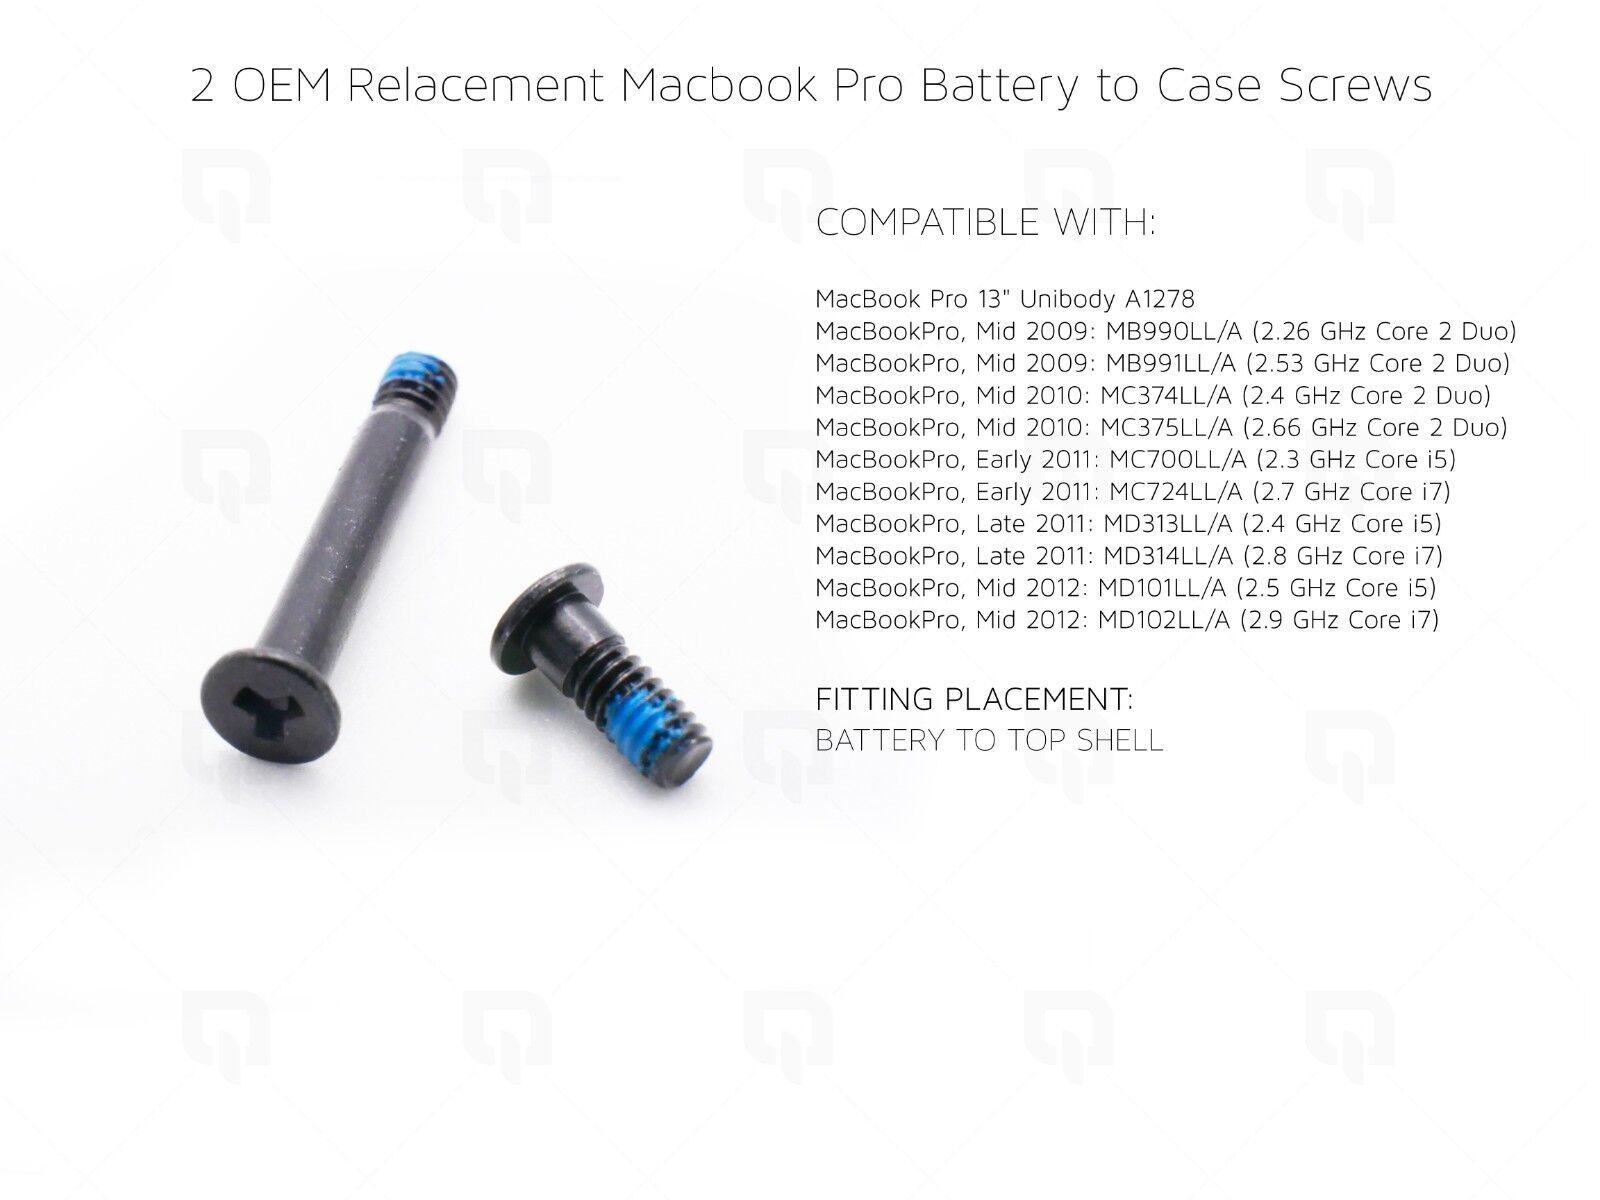 2 x Genuine Screws for Macbook Pro MacBook Pro Unibody A1278 Battery Screw Parts